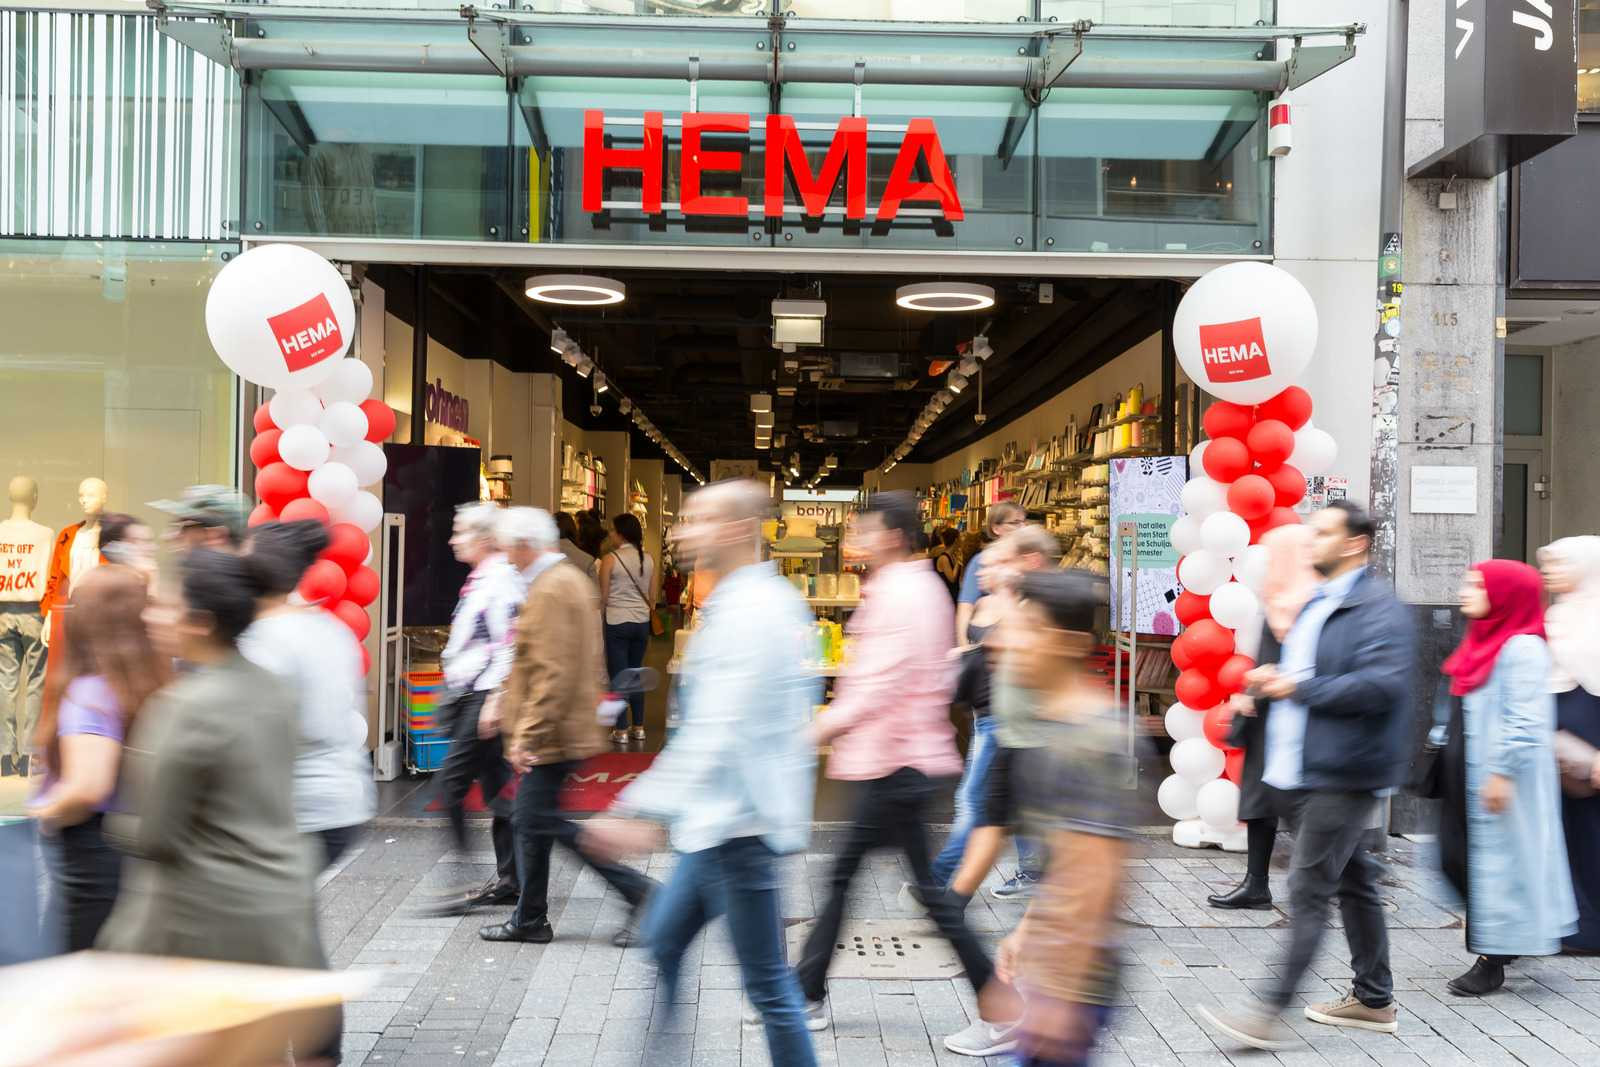 Магазин HEMA. Фото: Marco Verch/Flickr/CC-BY-2.0.